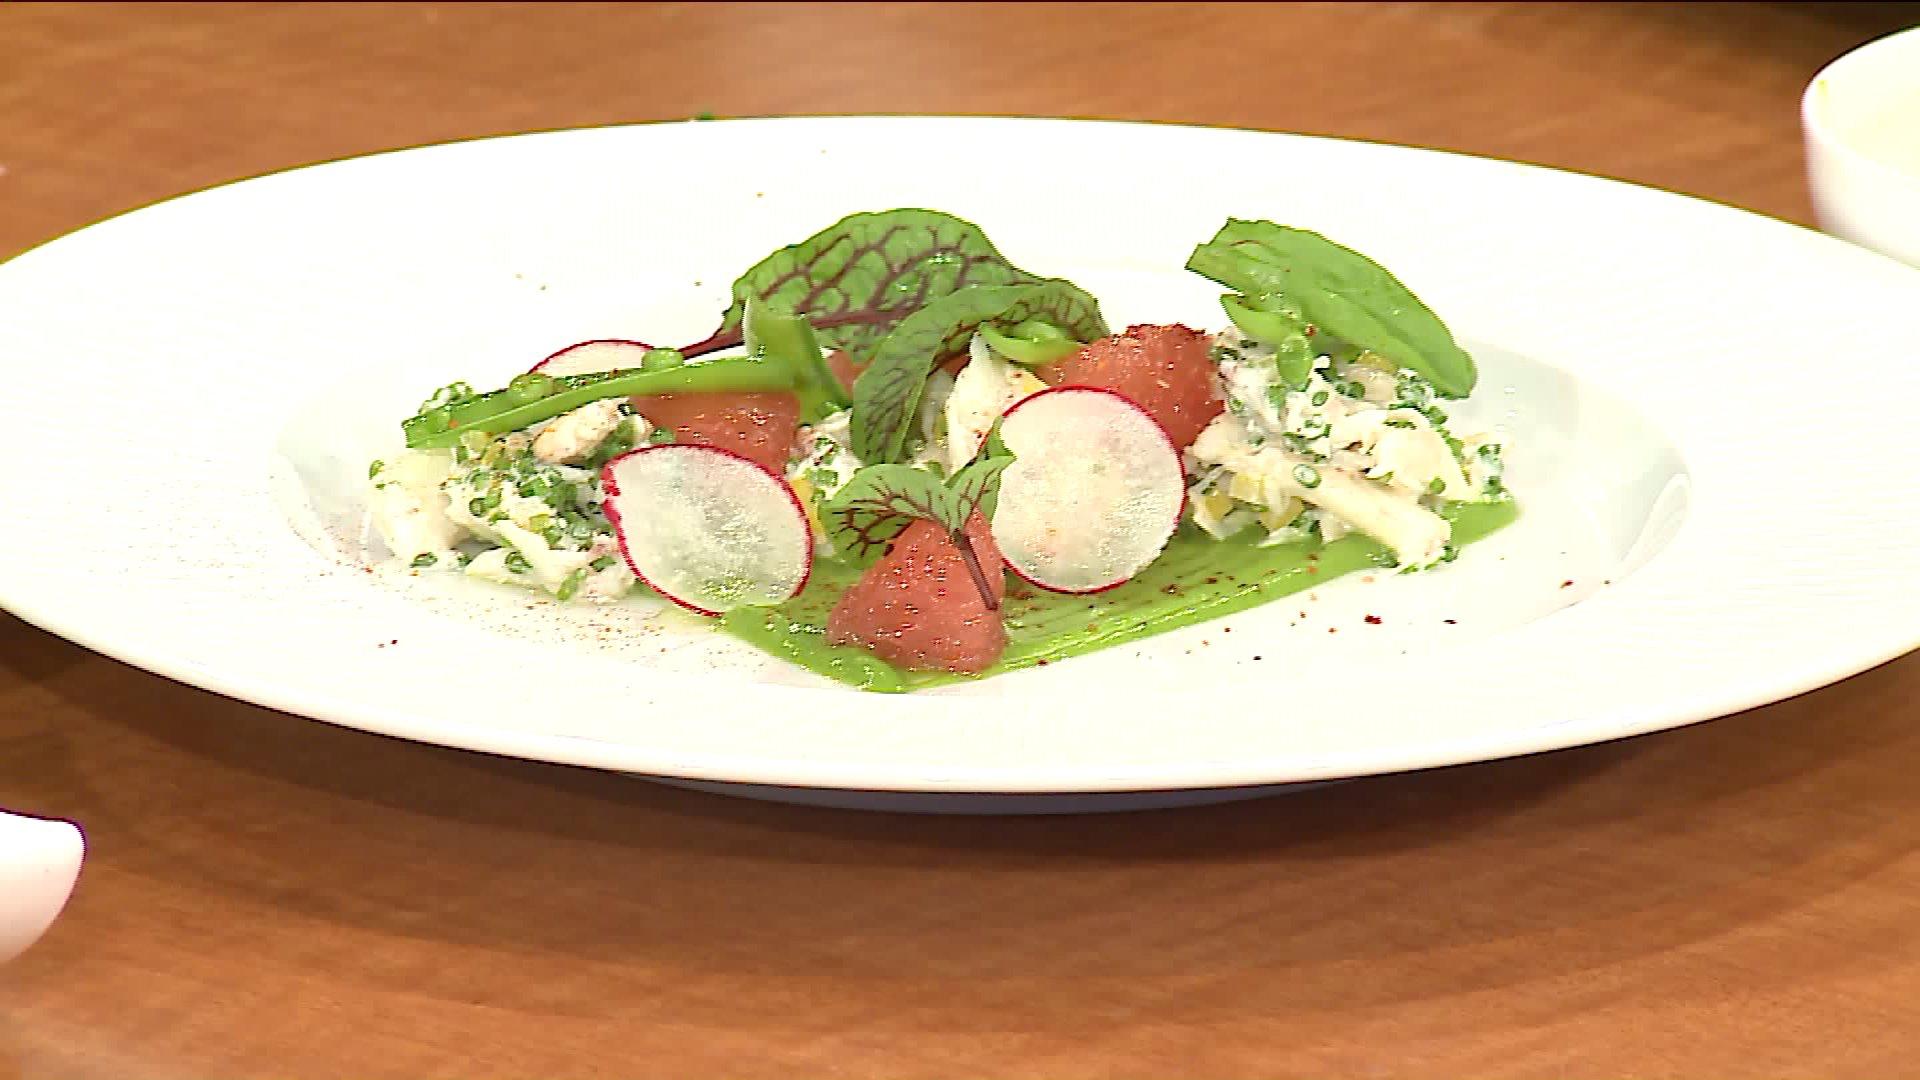 How To Make a Summer Crab Salad